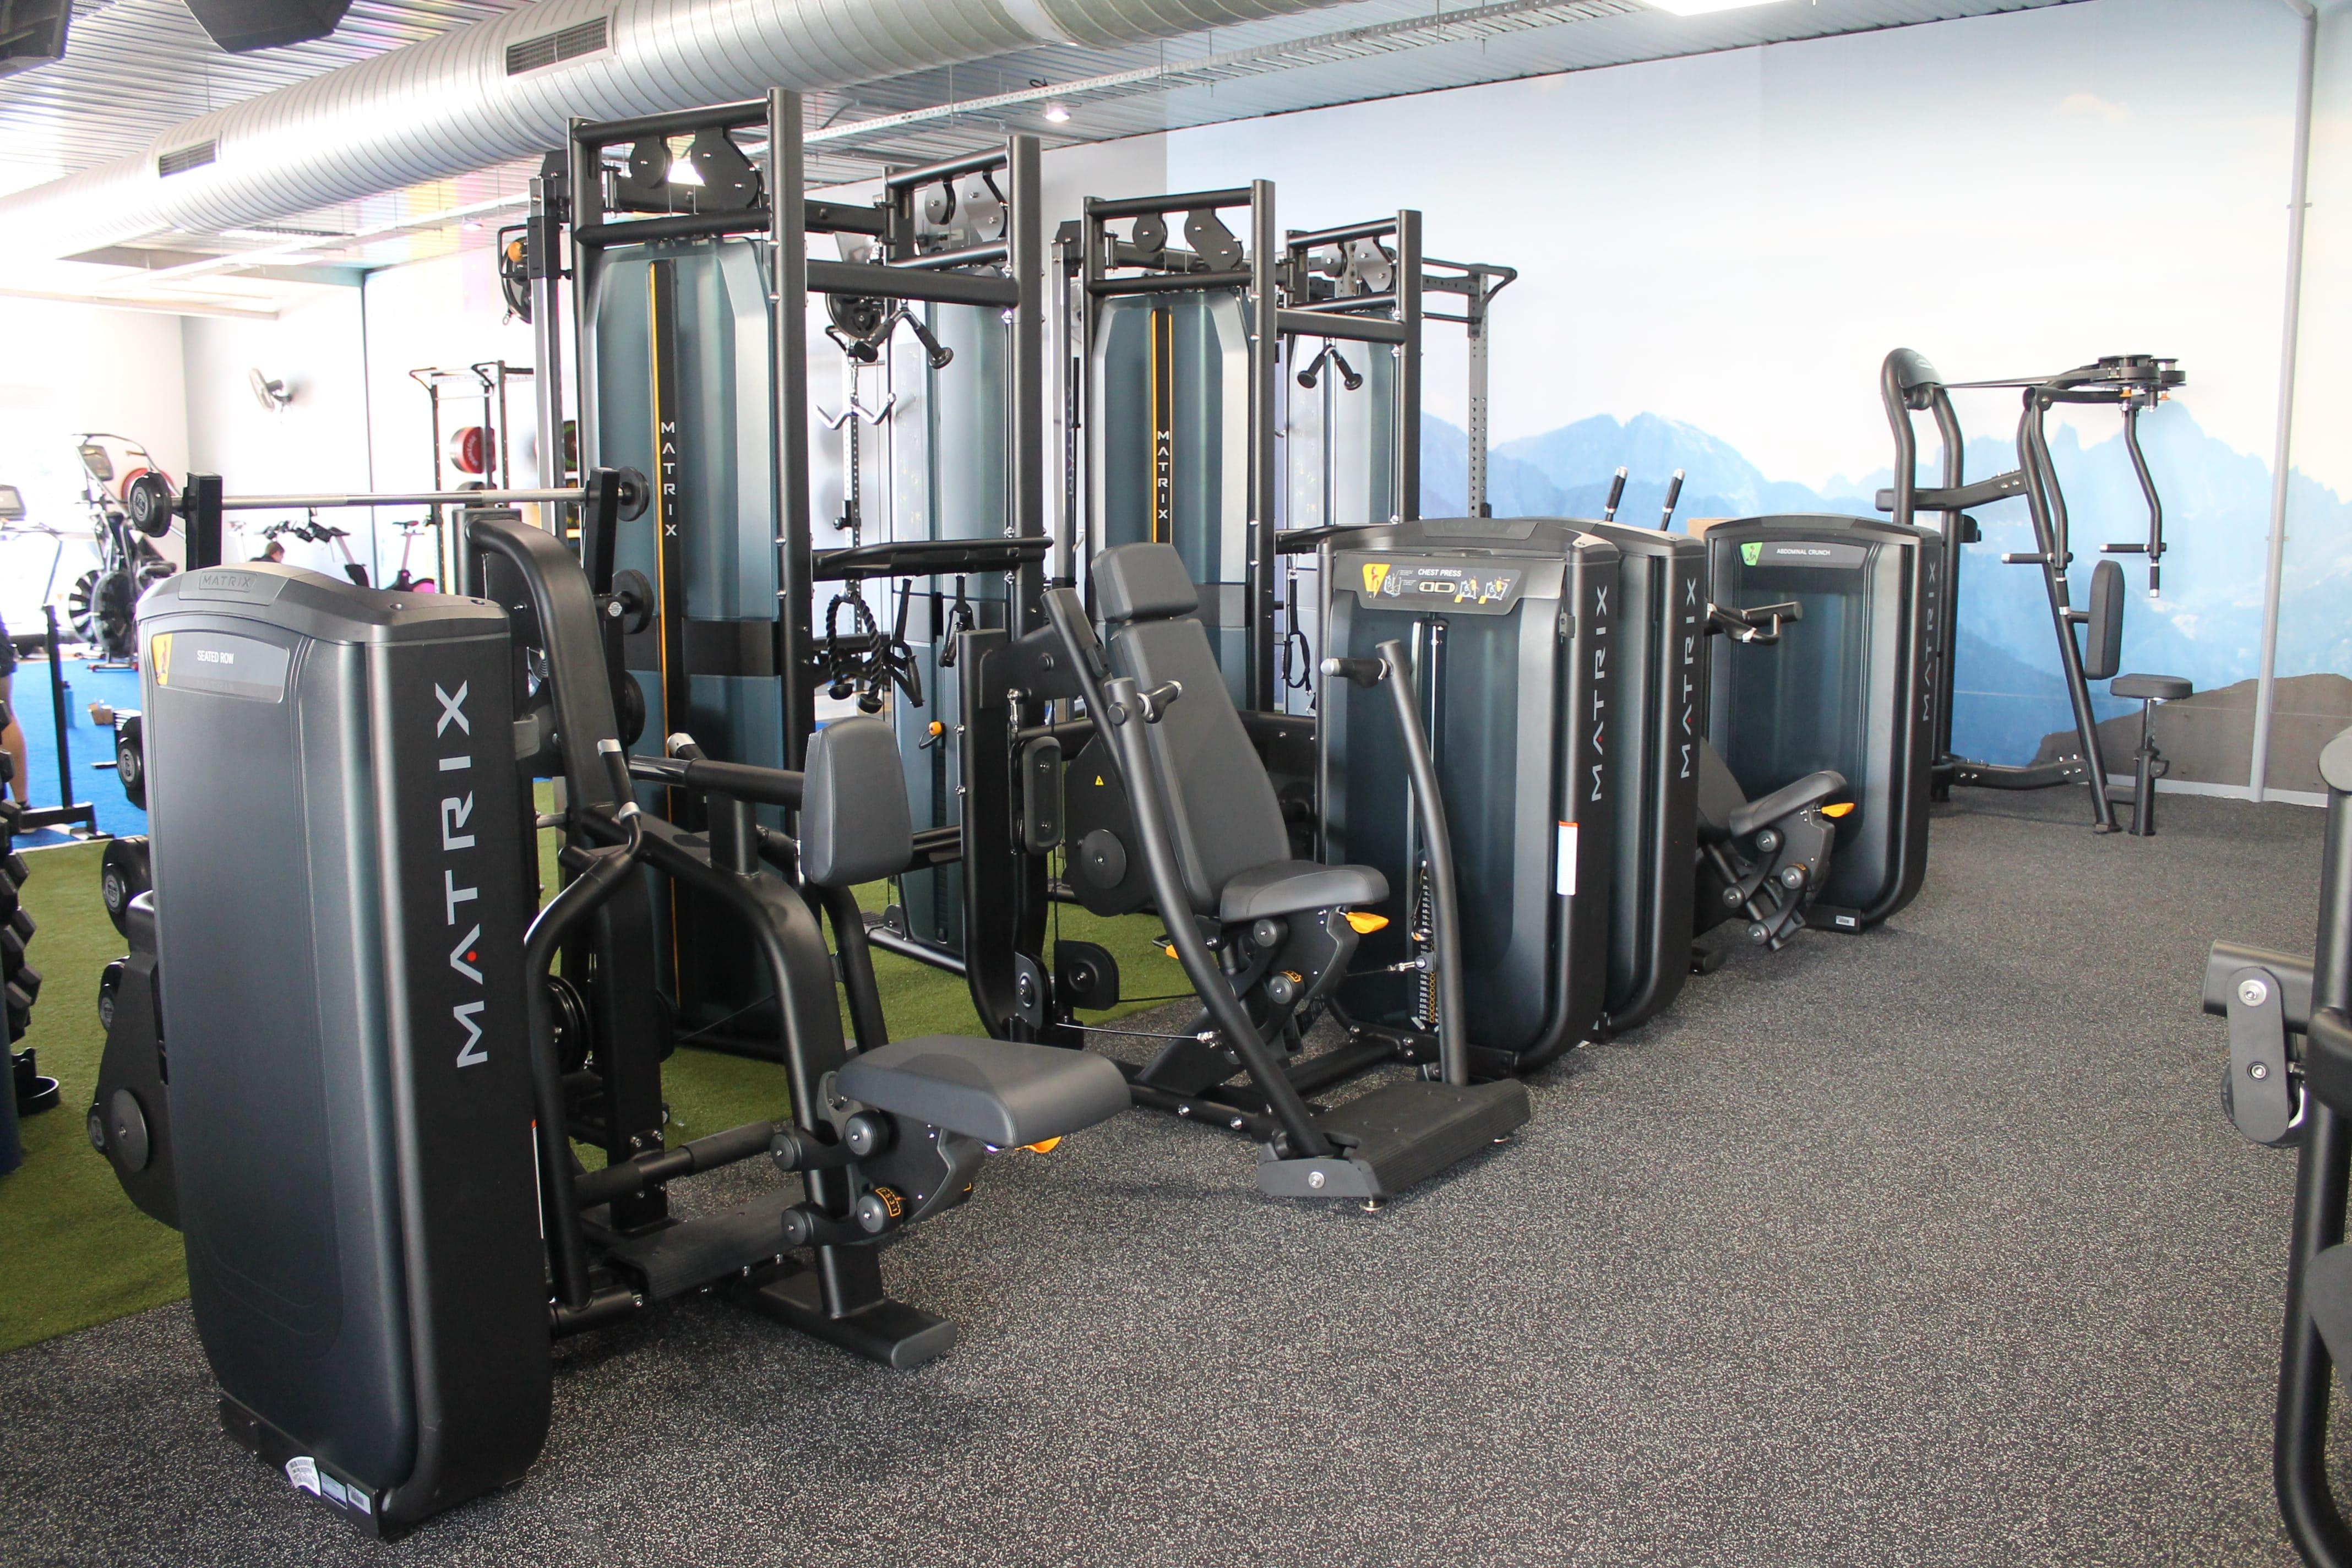 Commercial fitness & home gym equipment matrix fitness australia